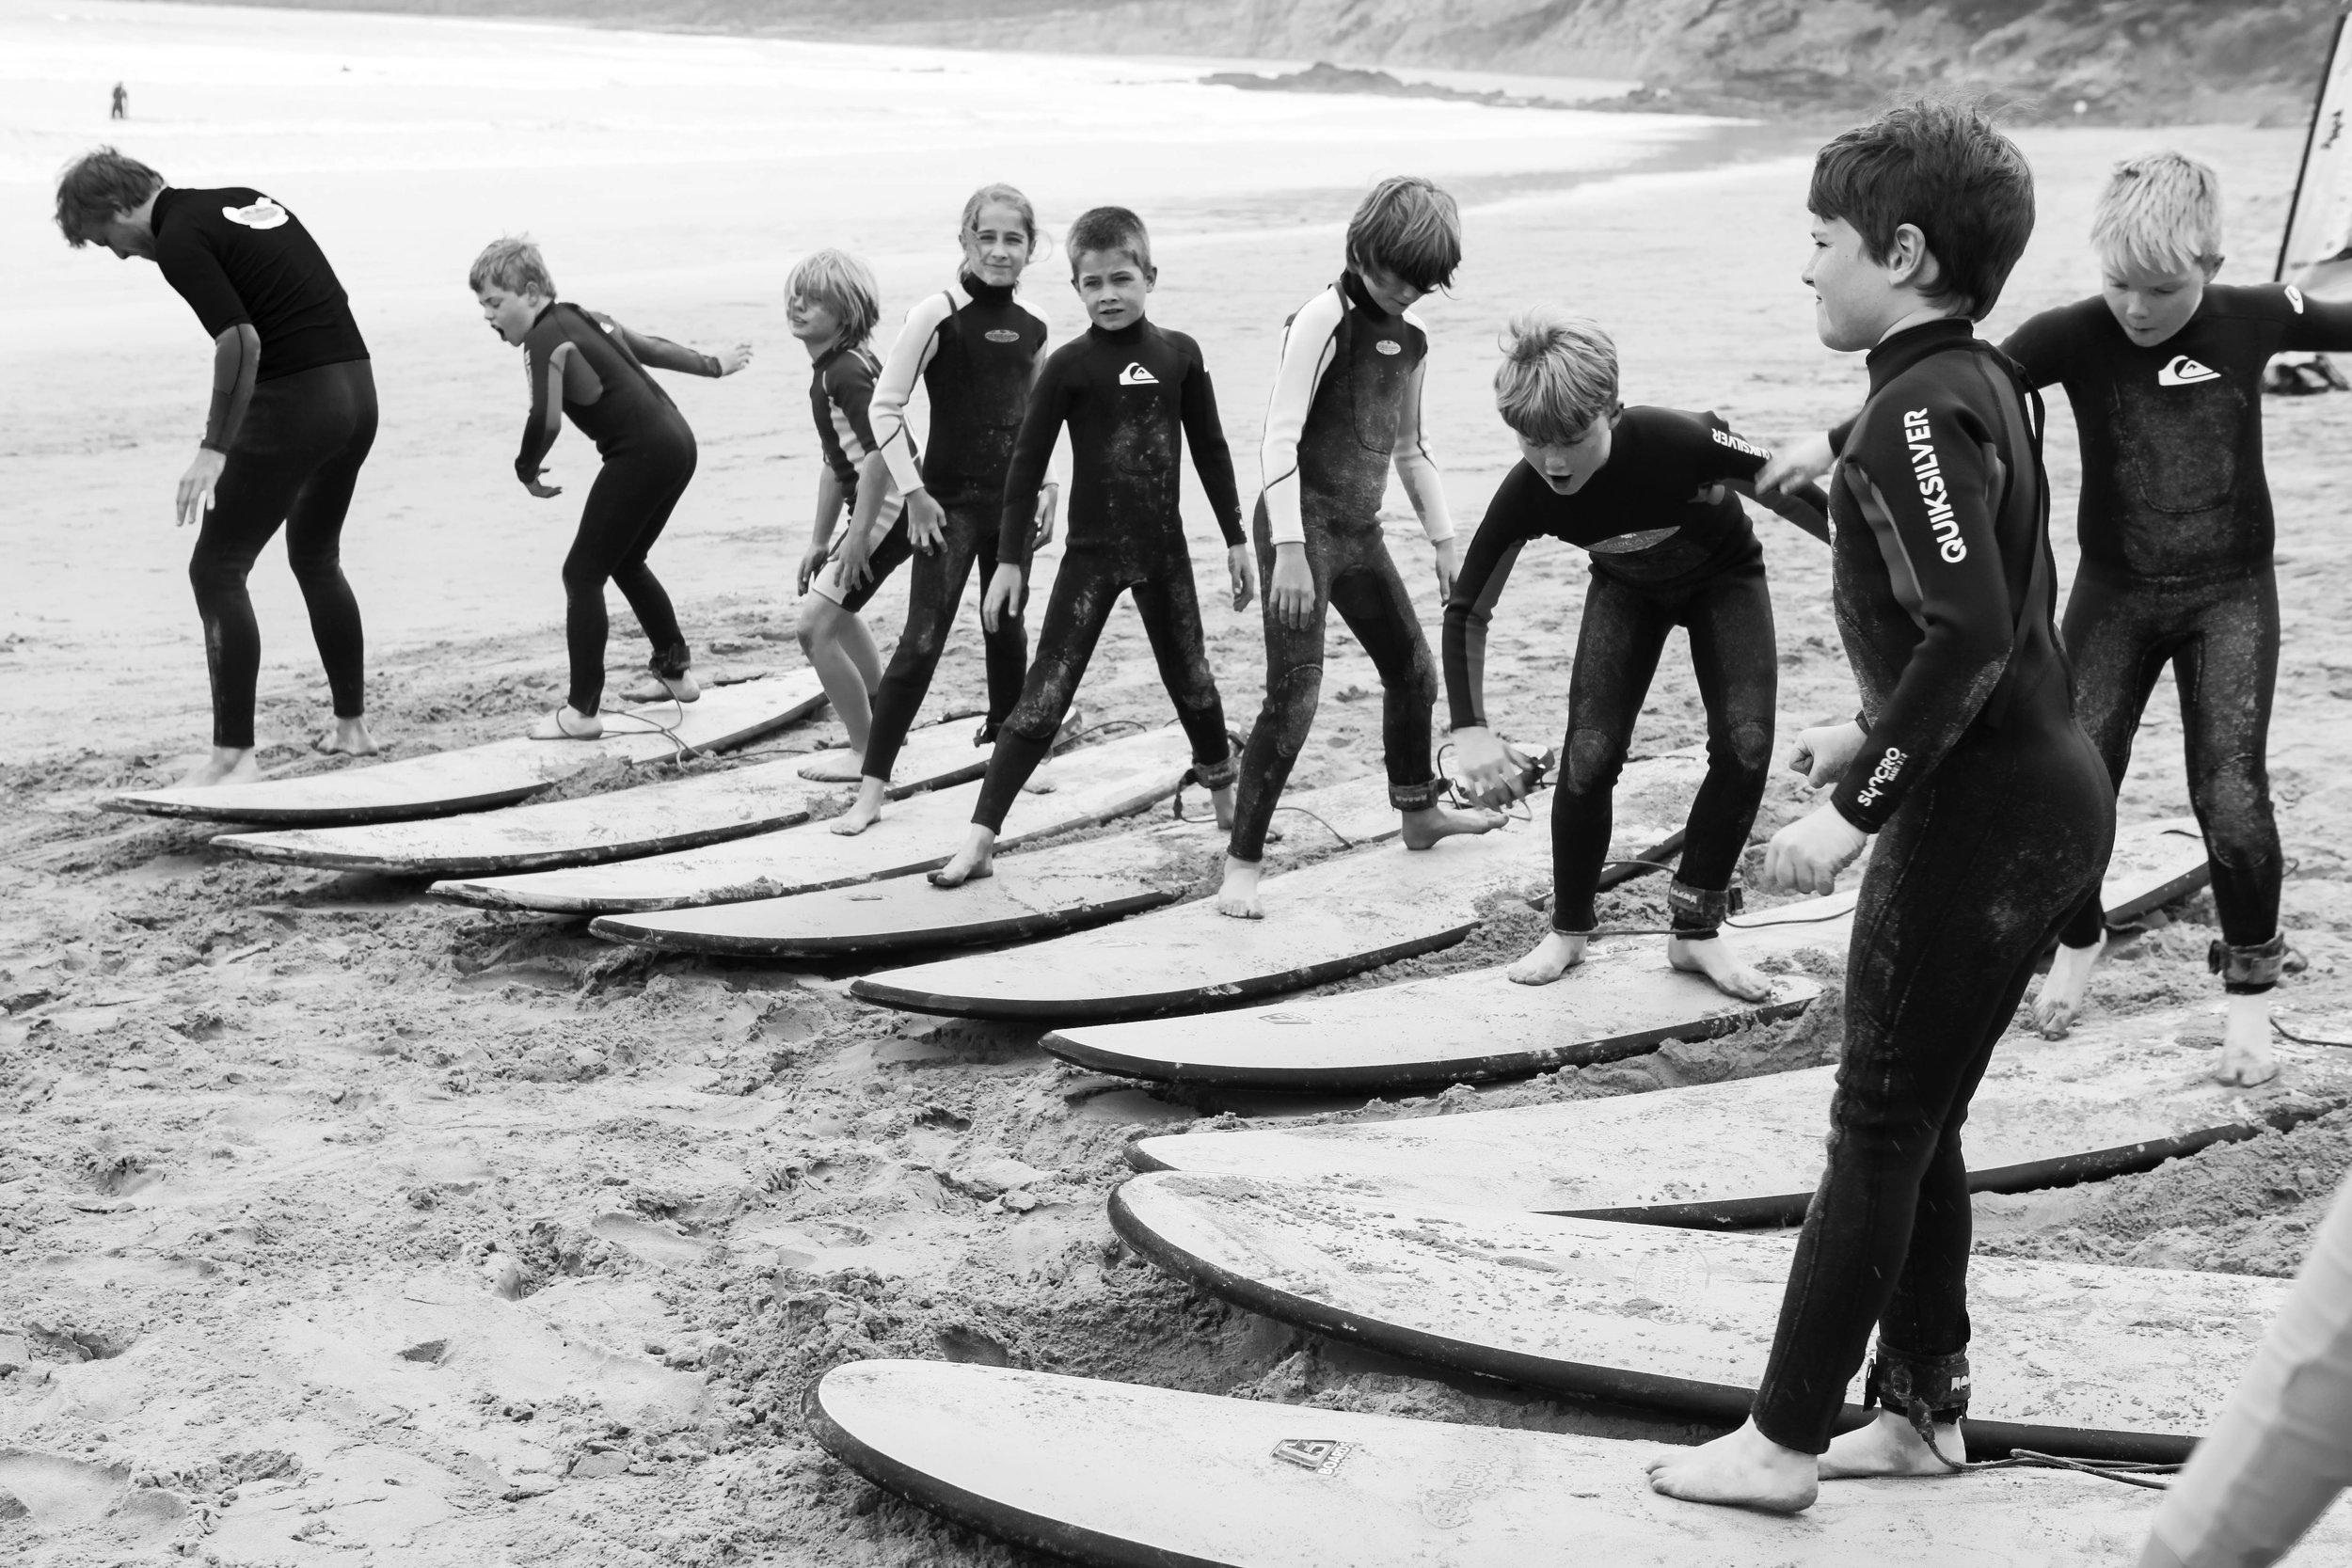 surf-stance_17115186445_o.jpg